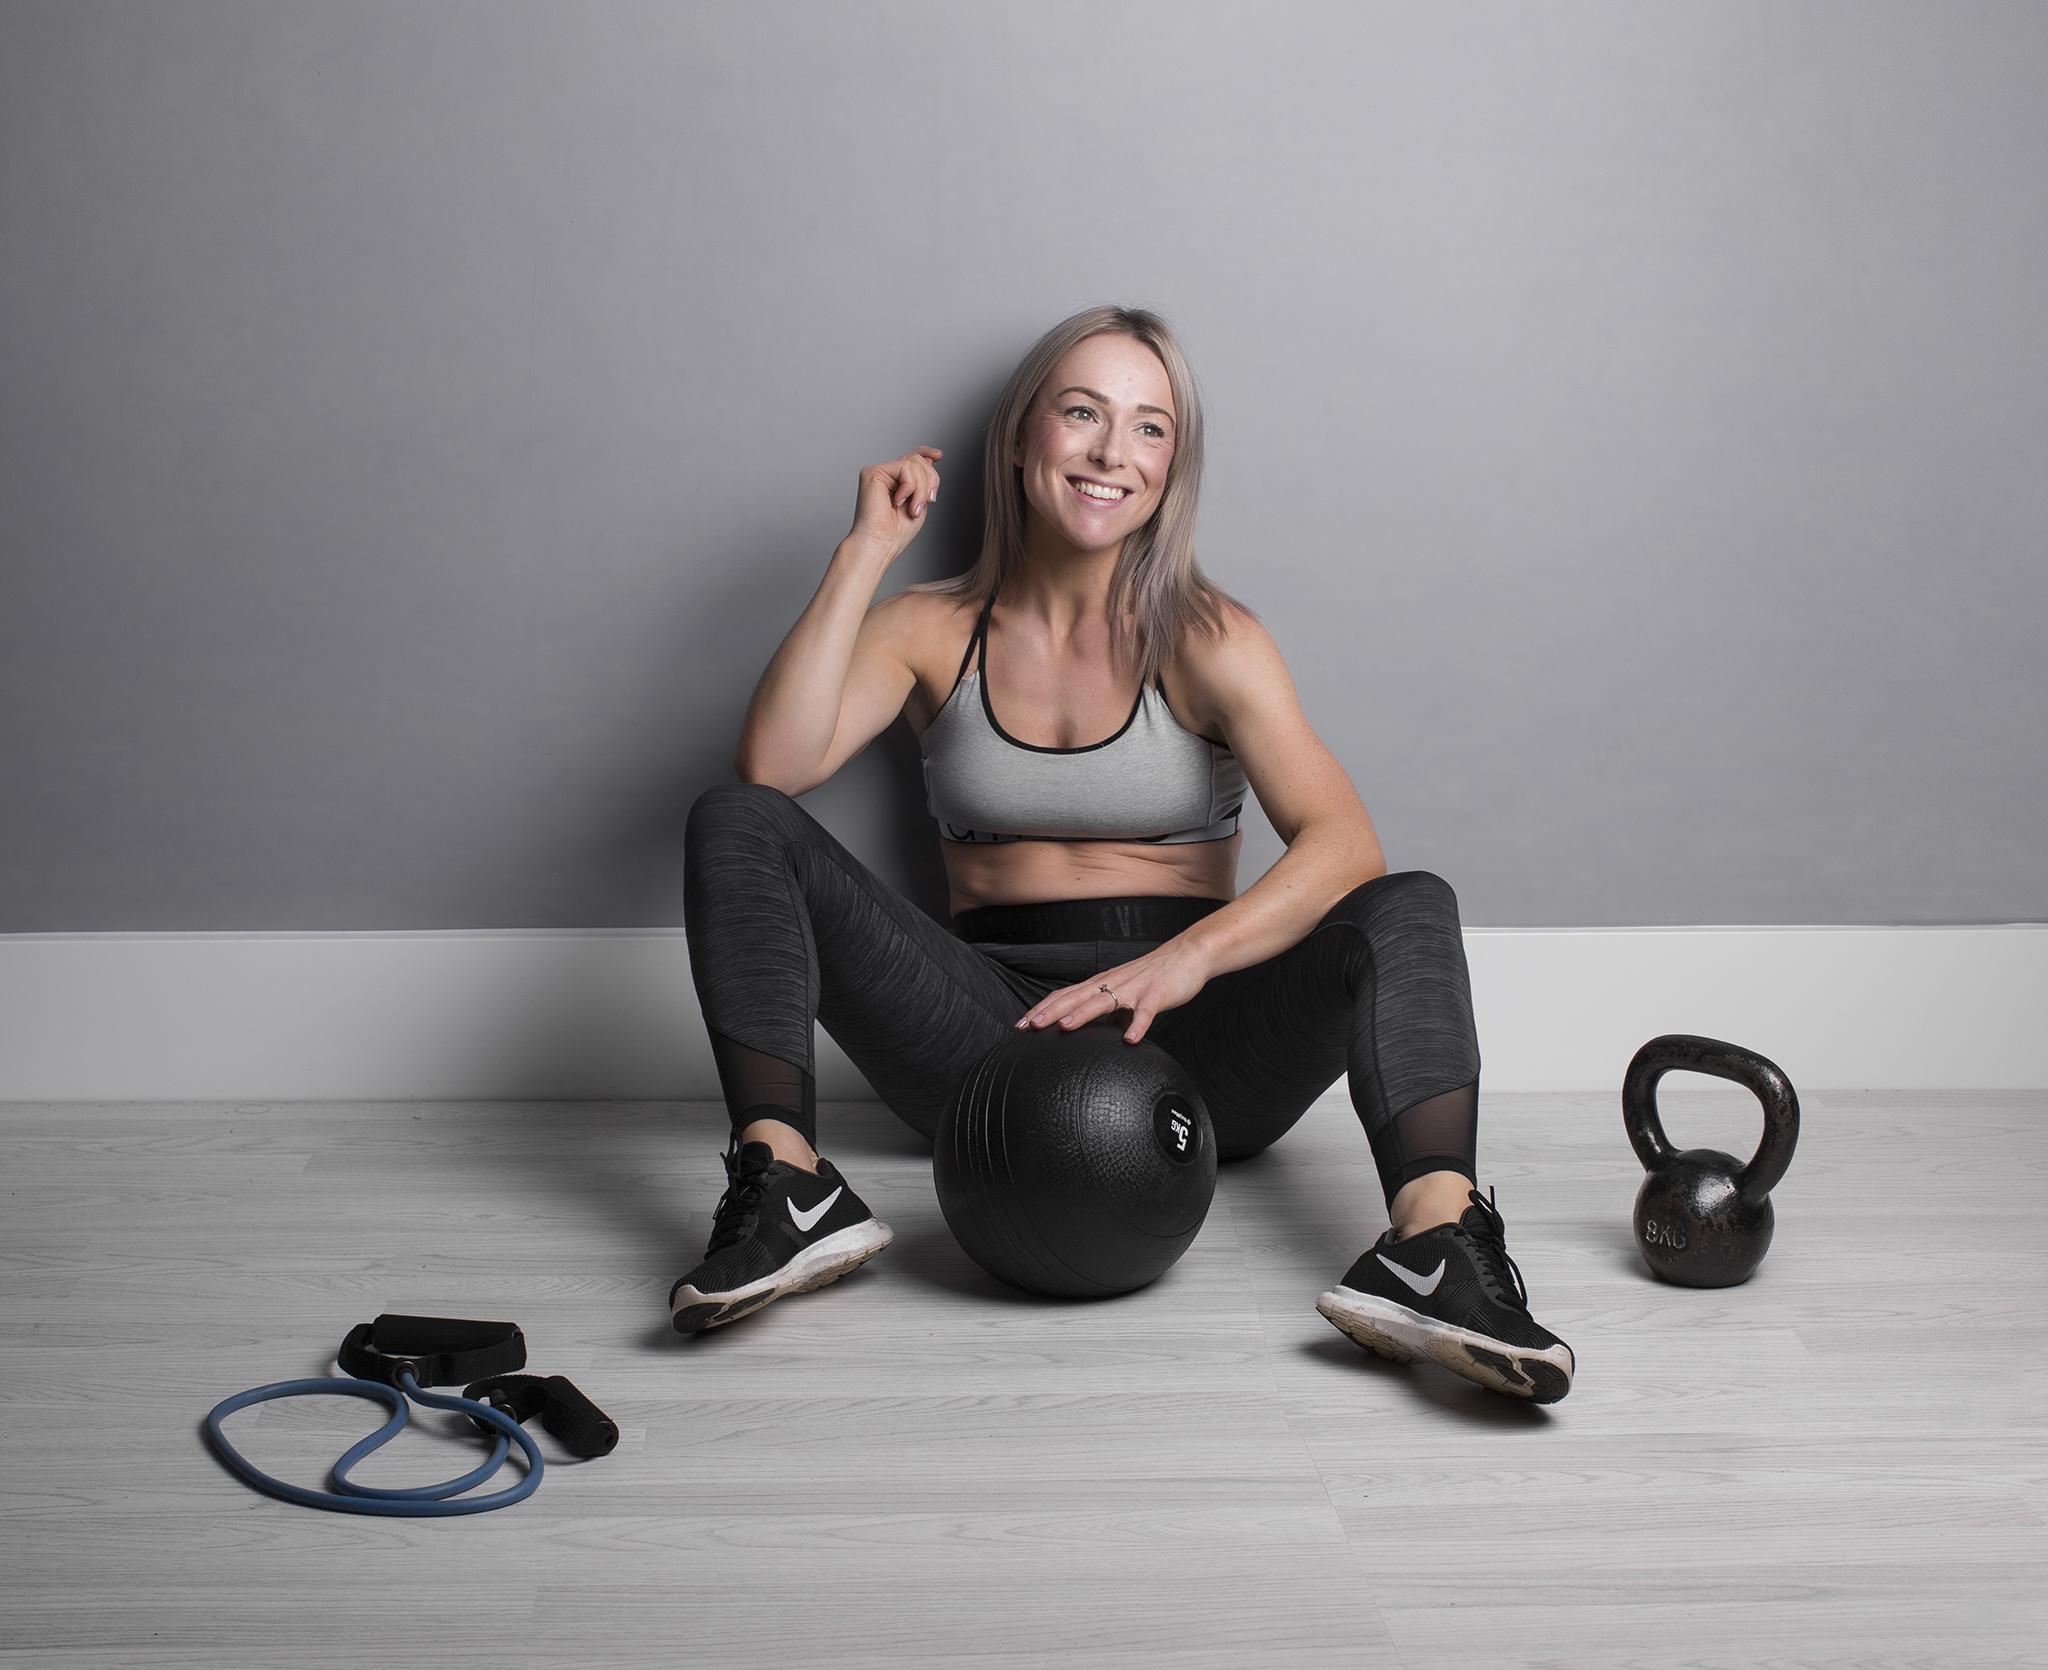 Lindsay_fitness_pt_corporate_photography_elizabethg_fineart_london.jpg